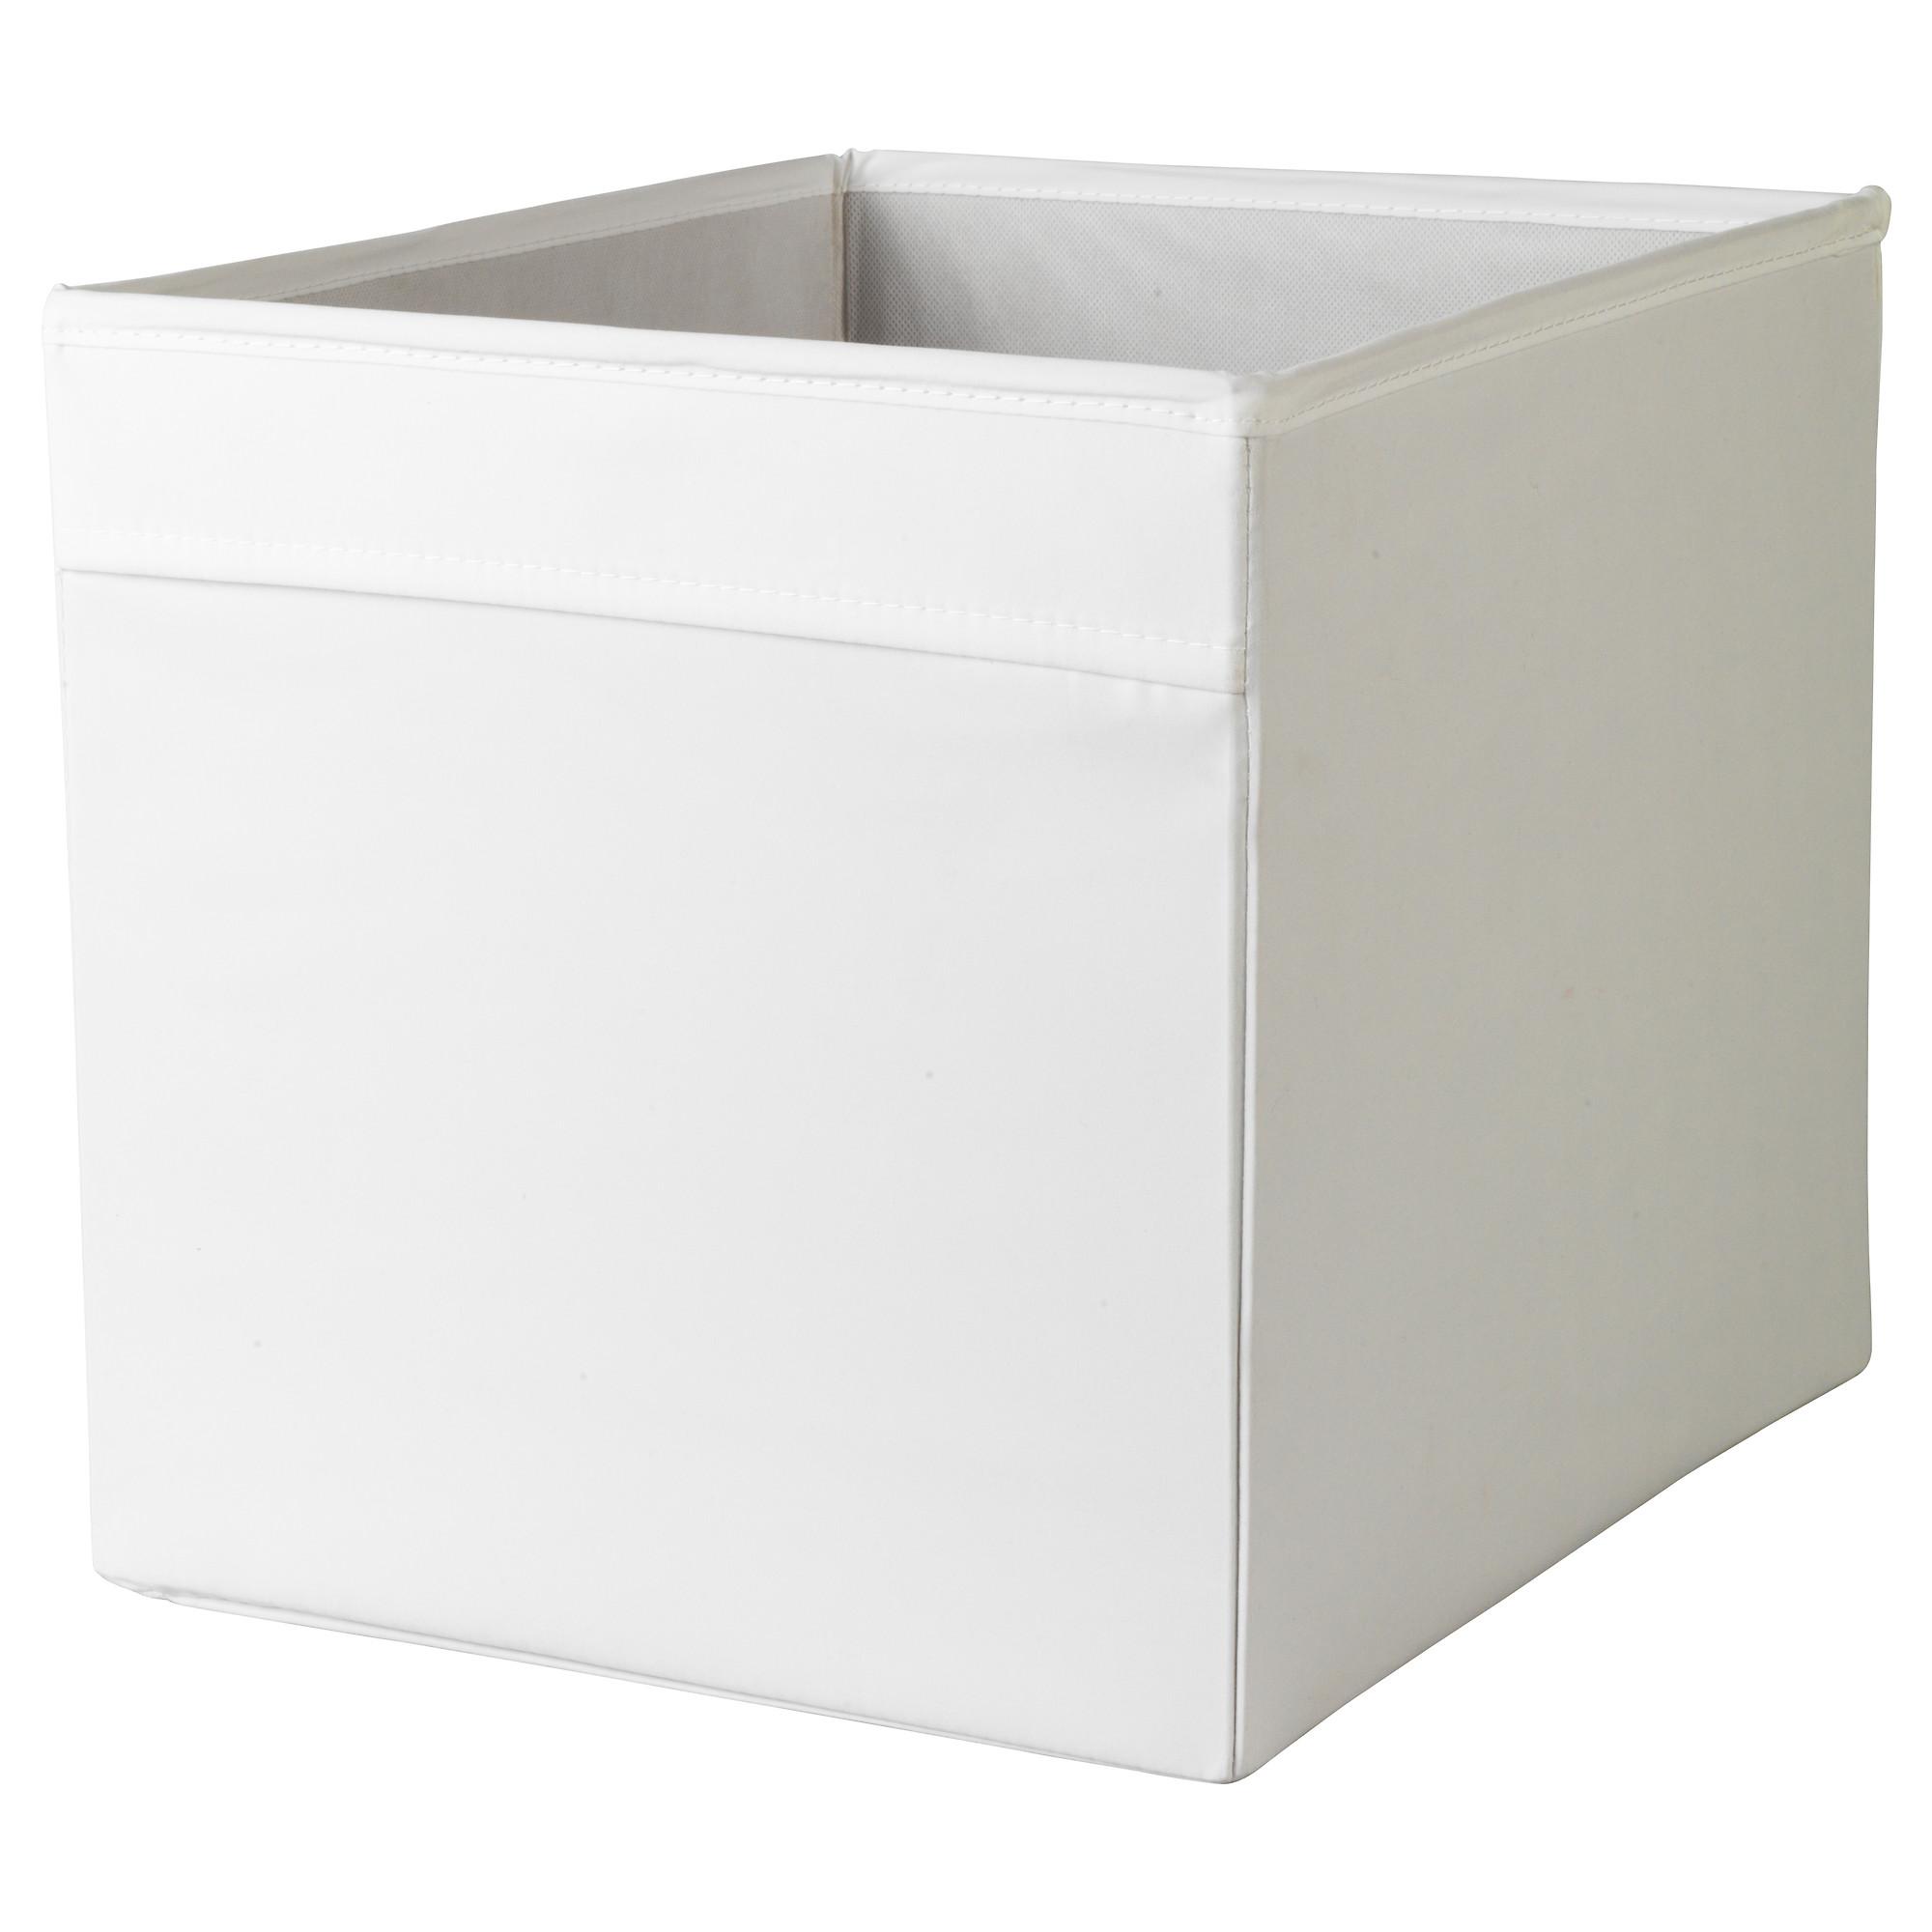 ikea dr na wei fach box expedit kallax regal. Black Bedroom Furniture Sets. Home Design Ideas